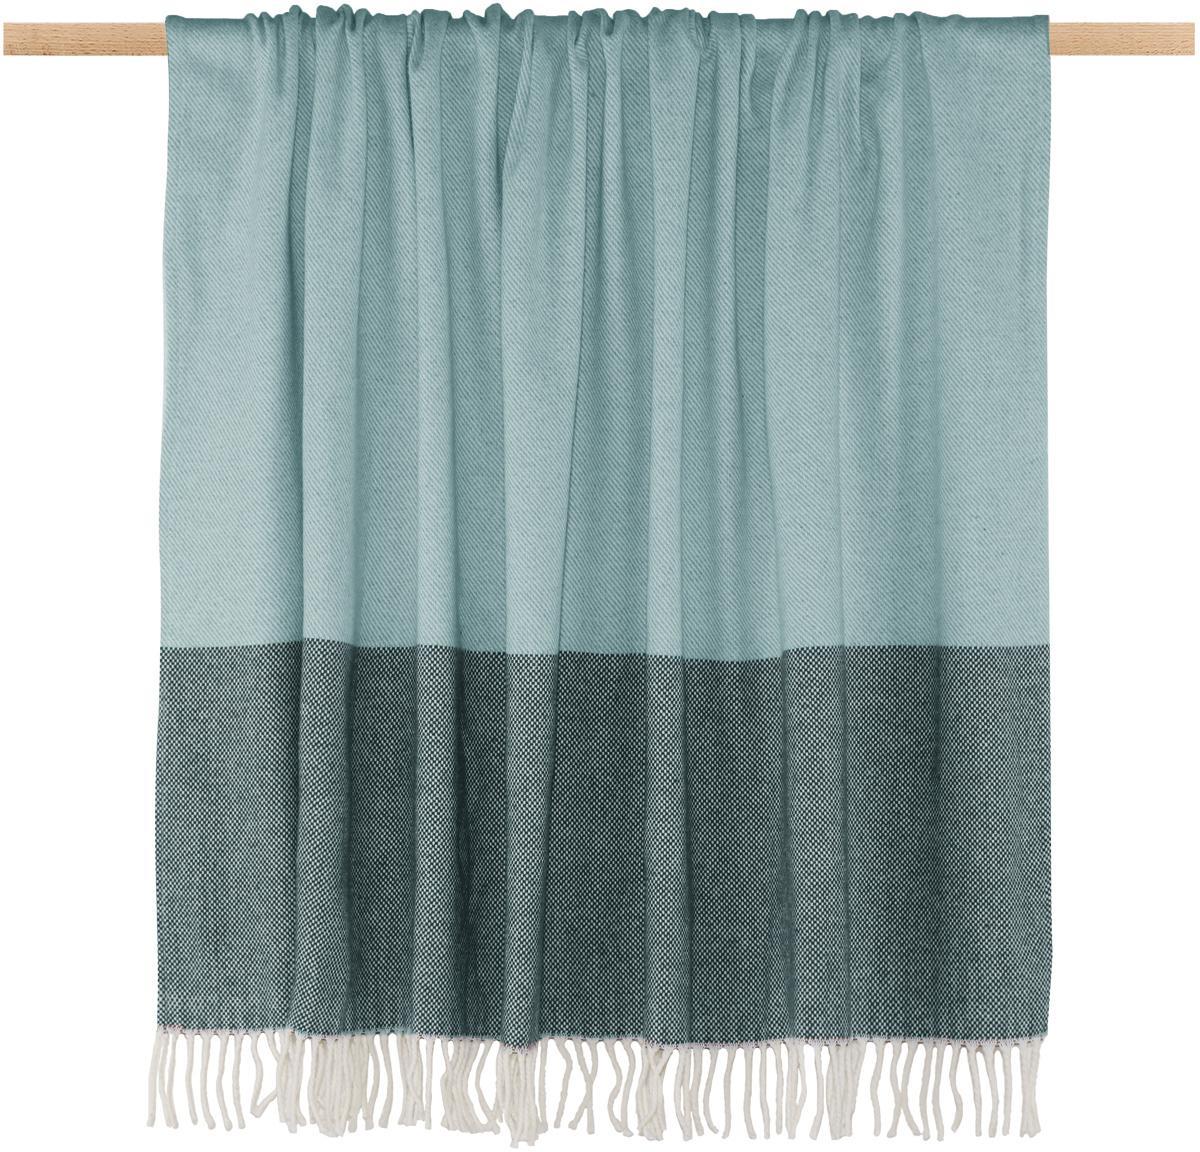 Plaid a righe Stripes, 50% cotone, 50% poliacrilico, Toni blu, Larg. 150 x Lung. 200 cm